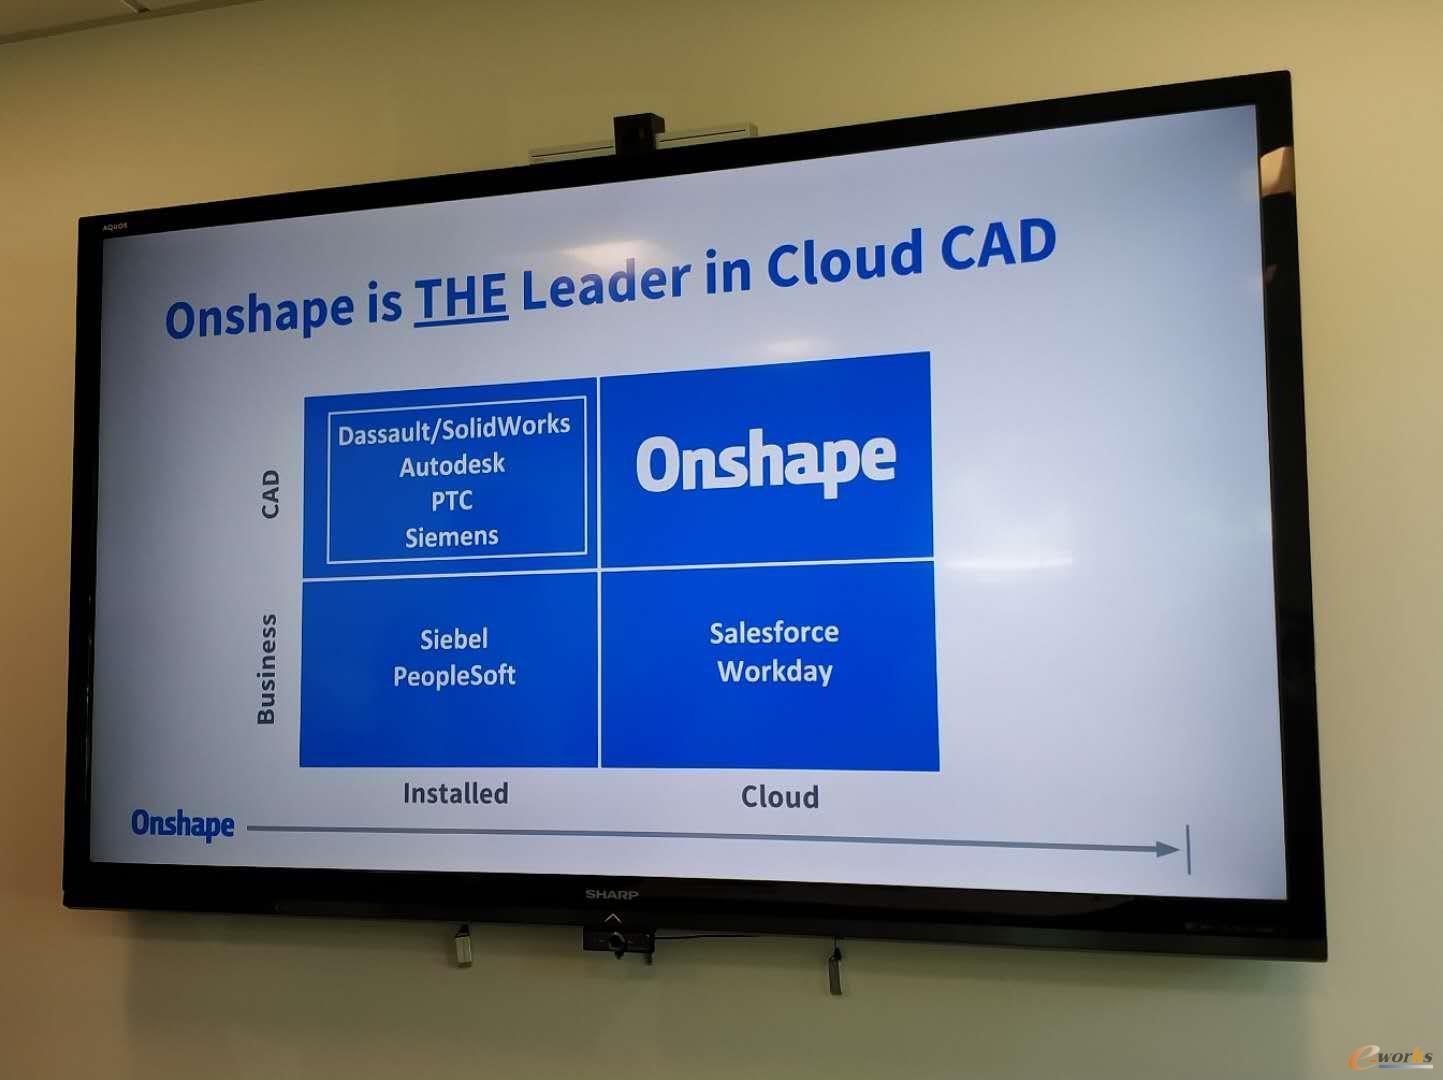 John与同事给考察团现场演示了Onshape软件